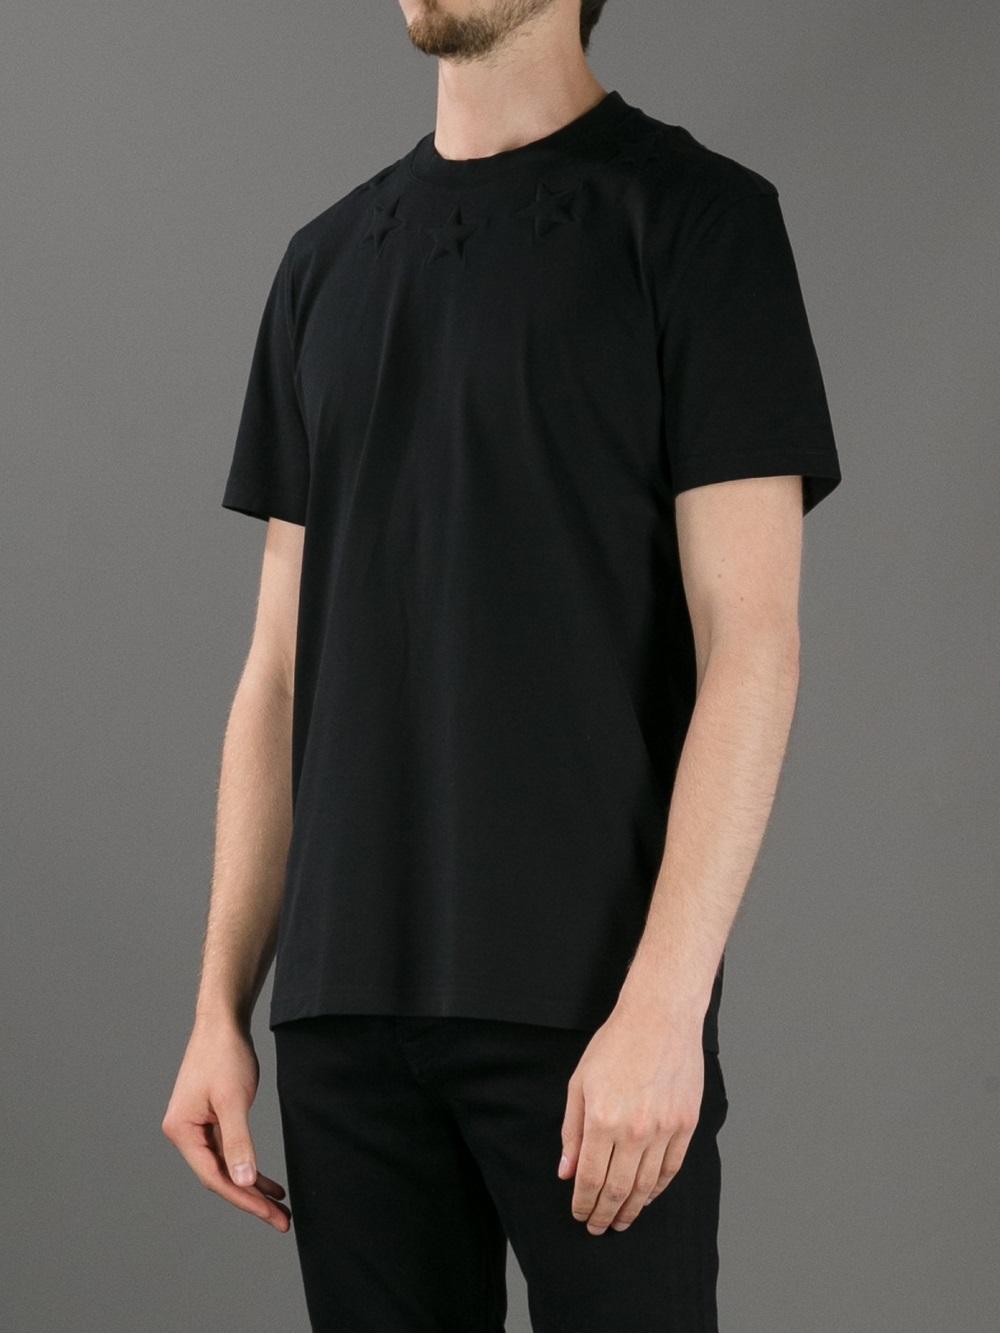 308c3cbd0016 Lyst - Givenchy Star Detailed Tshirt in Black for Men